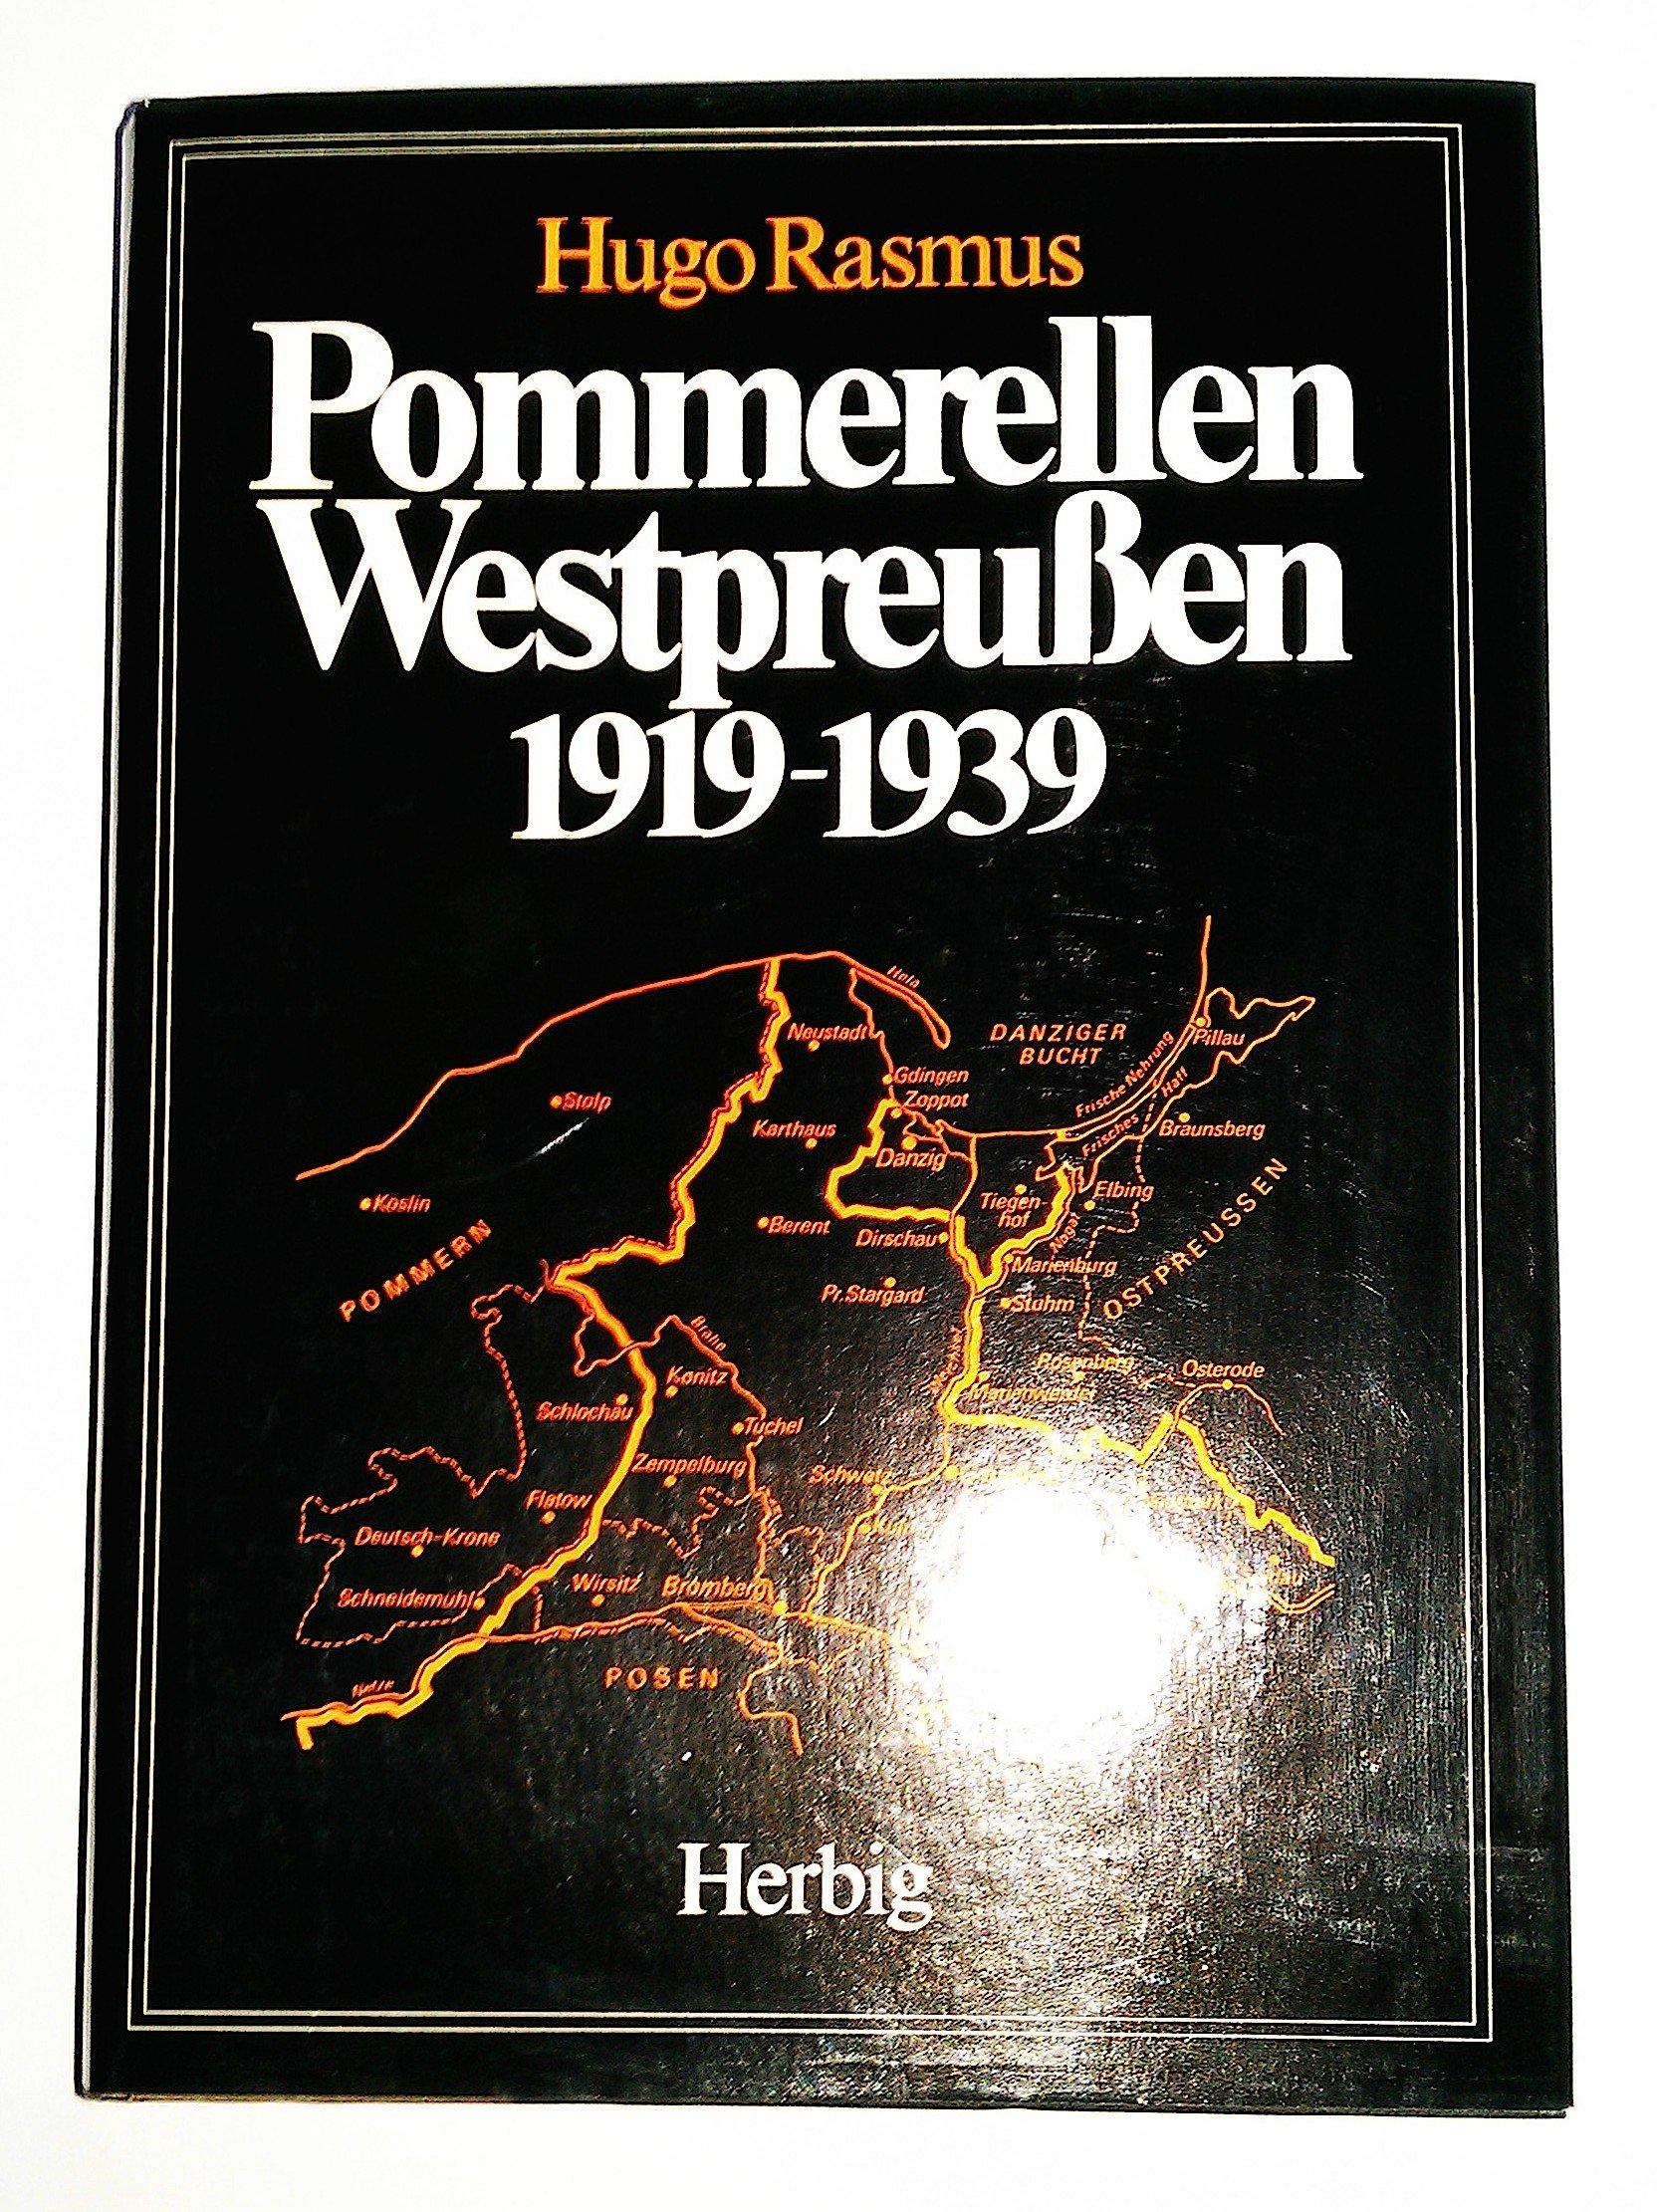 Pommerellen/Westpreußen 1919-1939